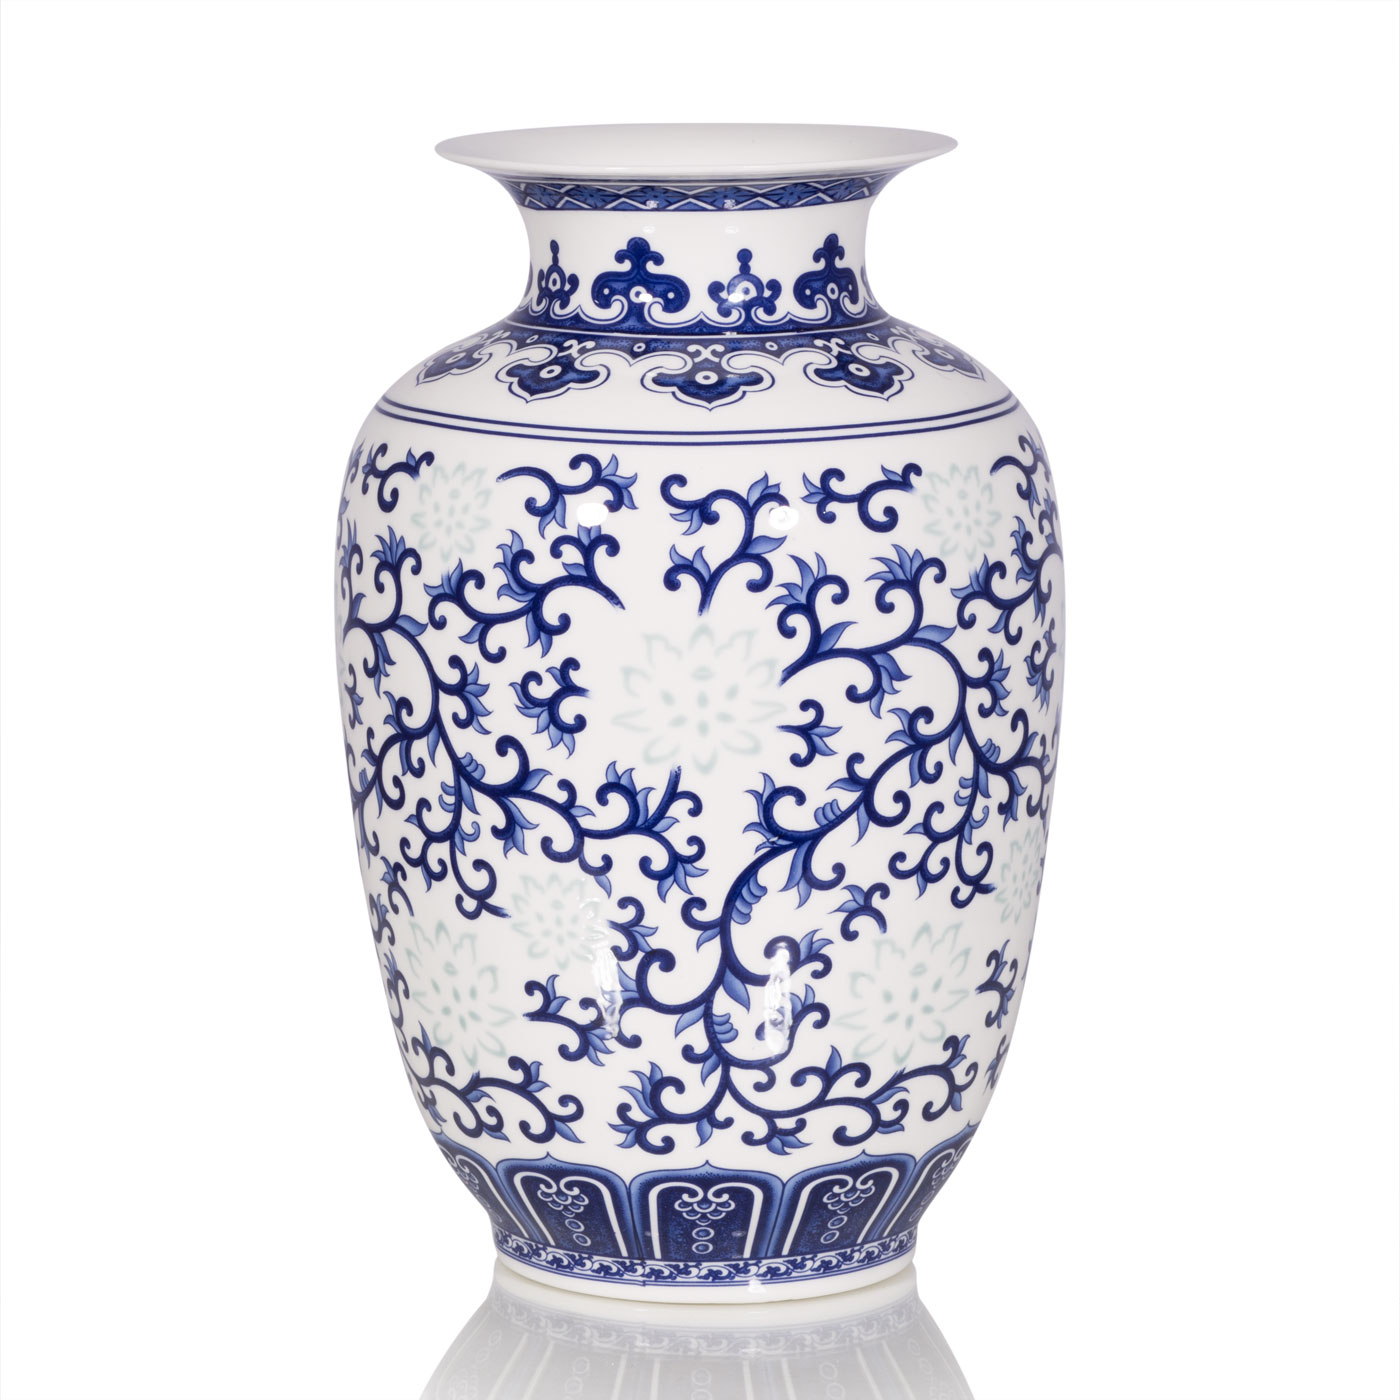 Купить Вазы Home Philosophy, Ваза Oriental Цвет: Бело-Синий (13х22 см), Китай, Белый, Синий, Фарфор